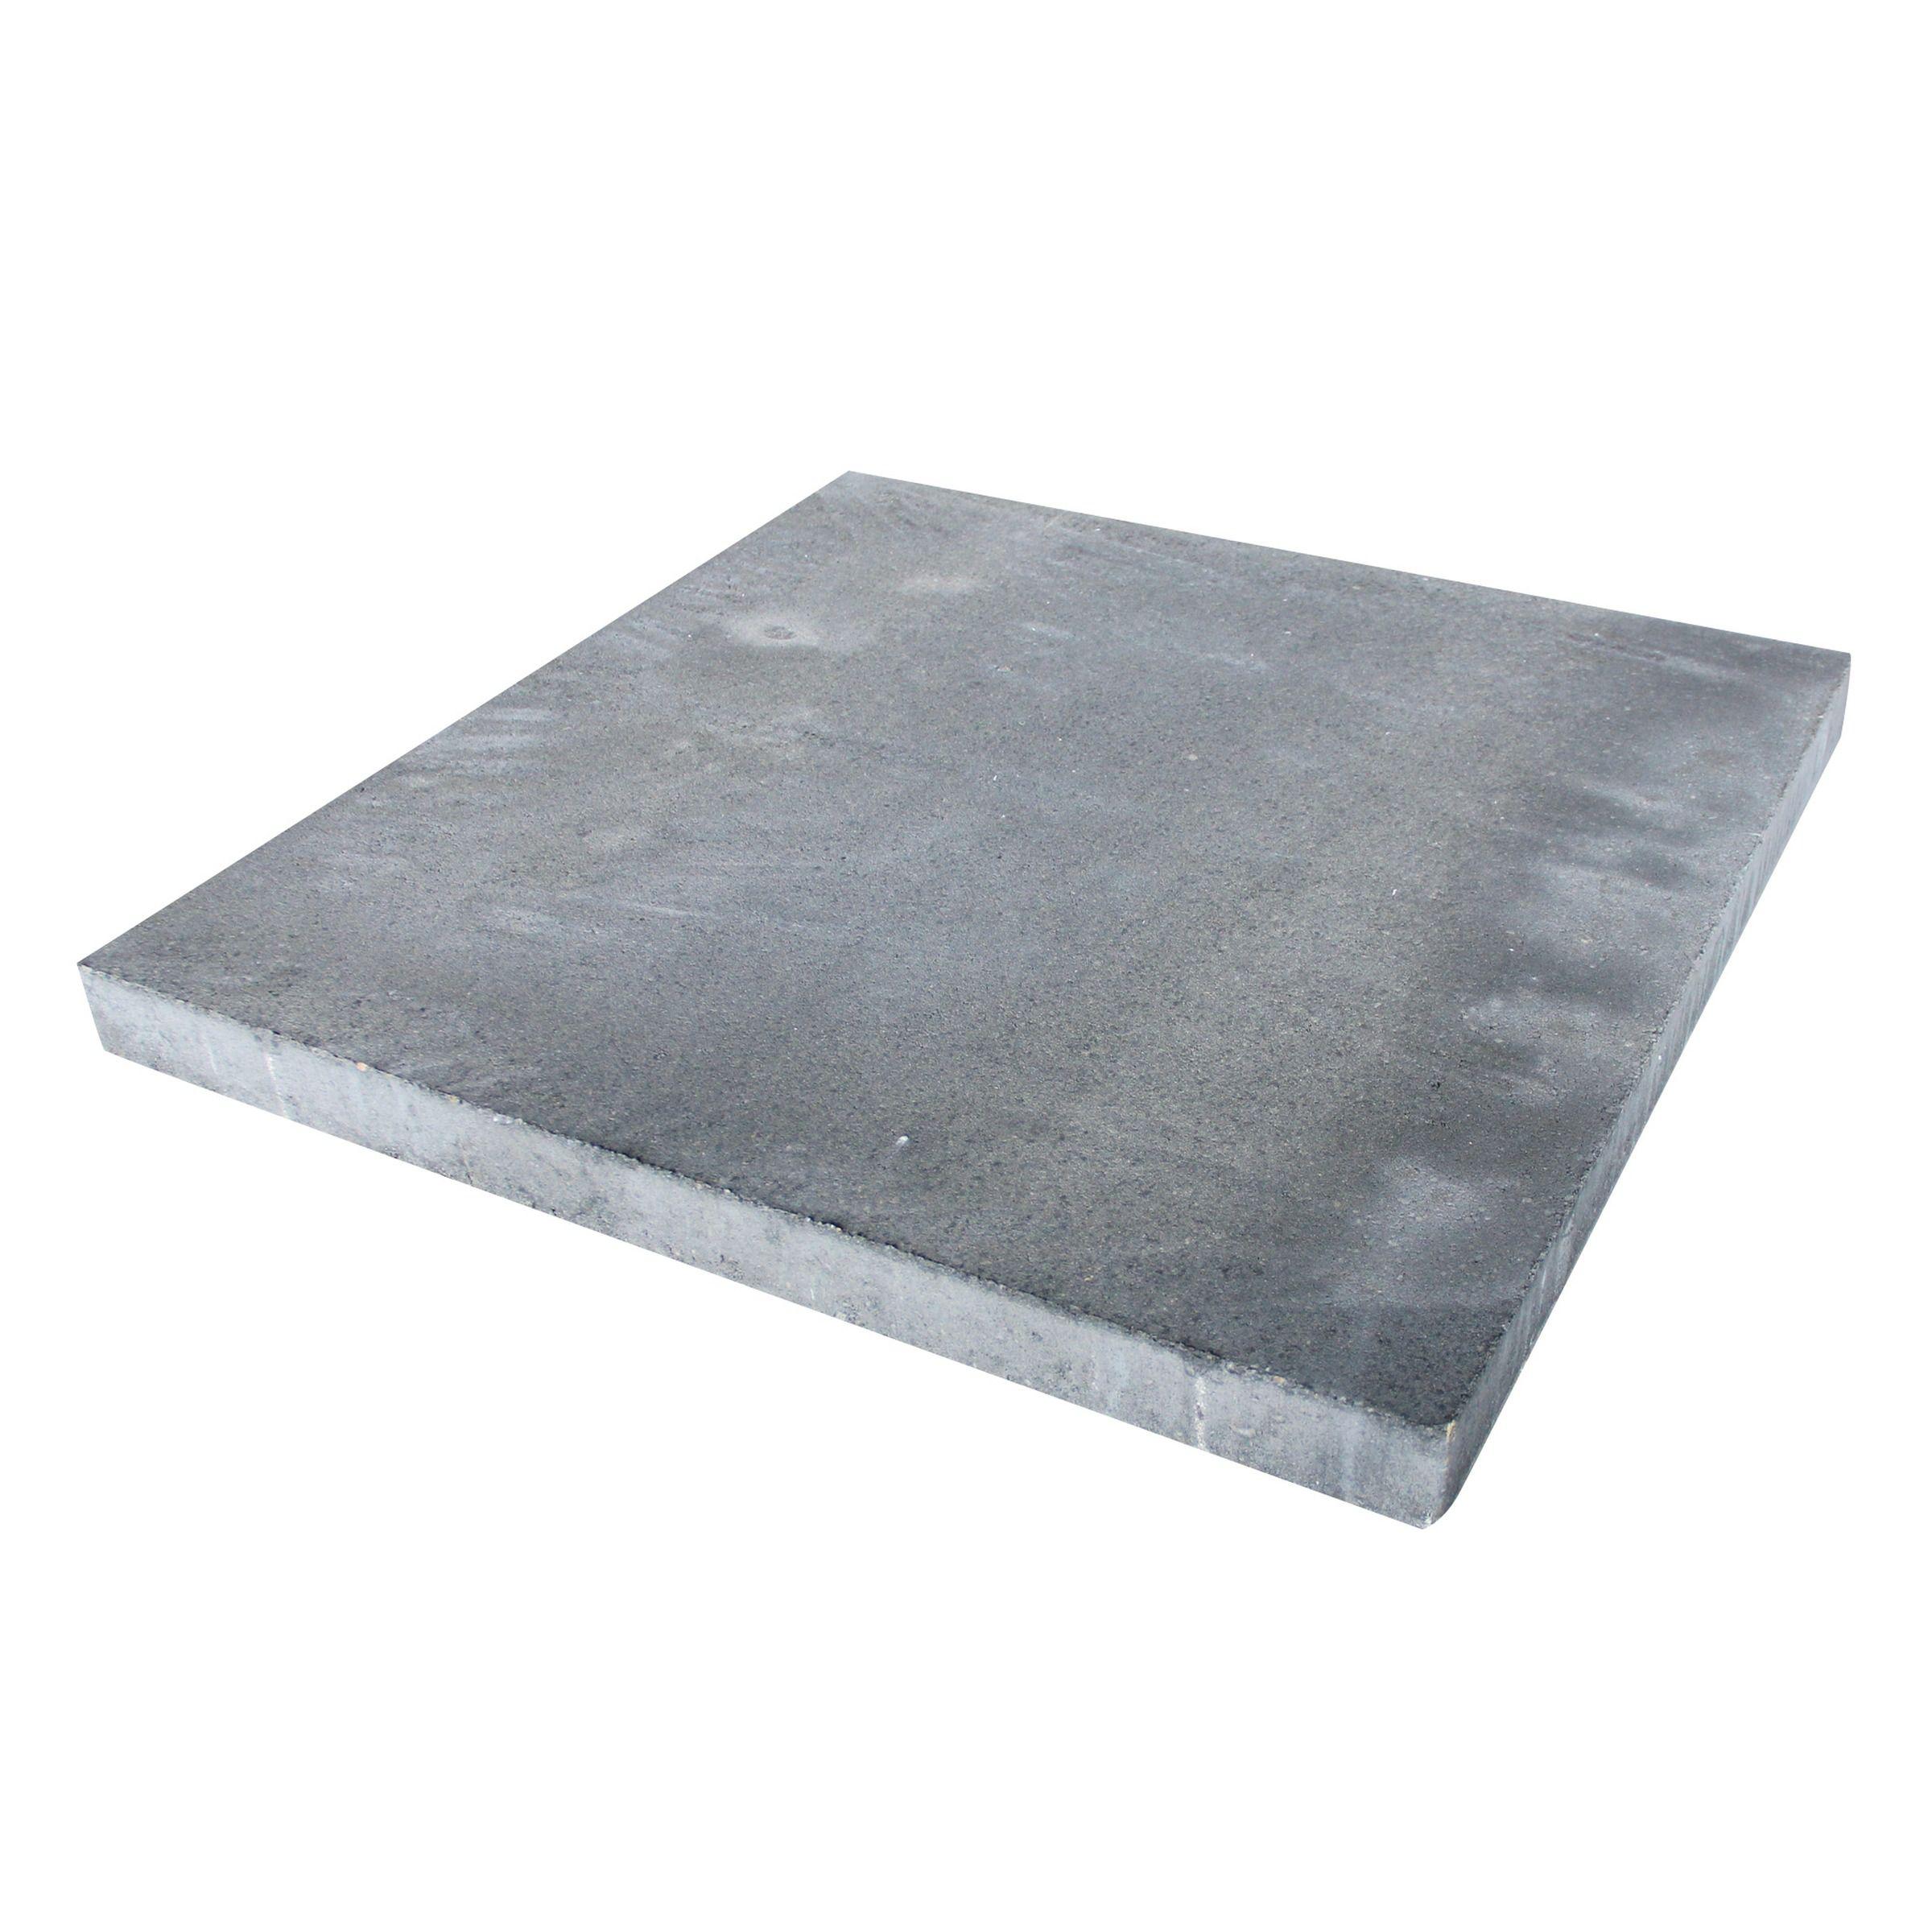 Terrastegels 60x60 Grijs.Terrastegel Beton Broadway Grijs 60x60 Cm 28 Tegels 10